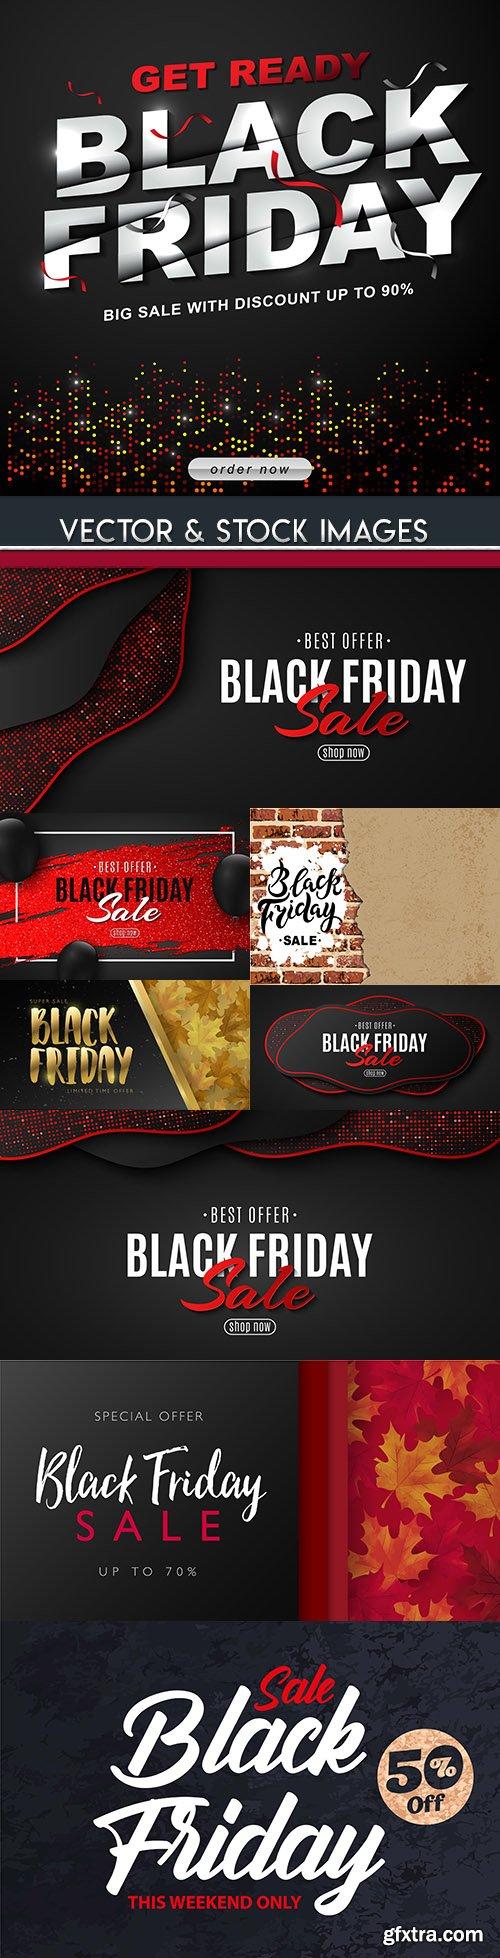 Black Friday and sale special design illustration 18